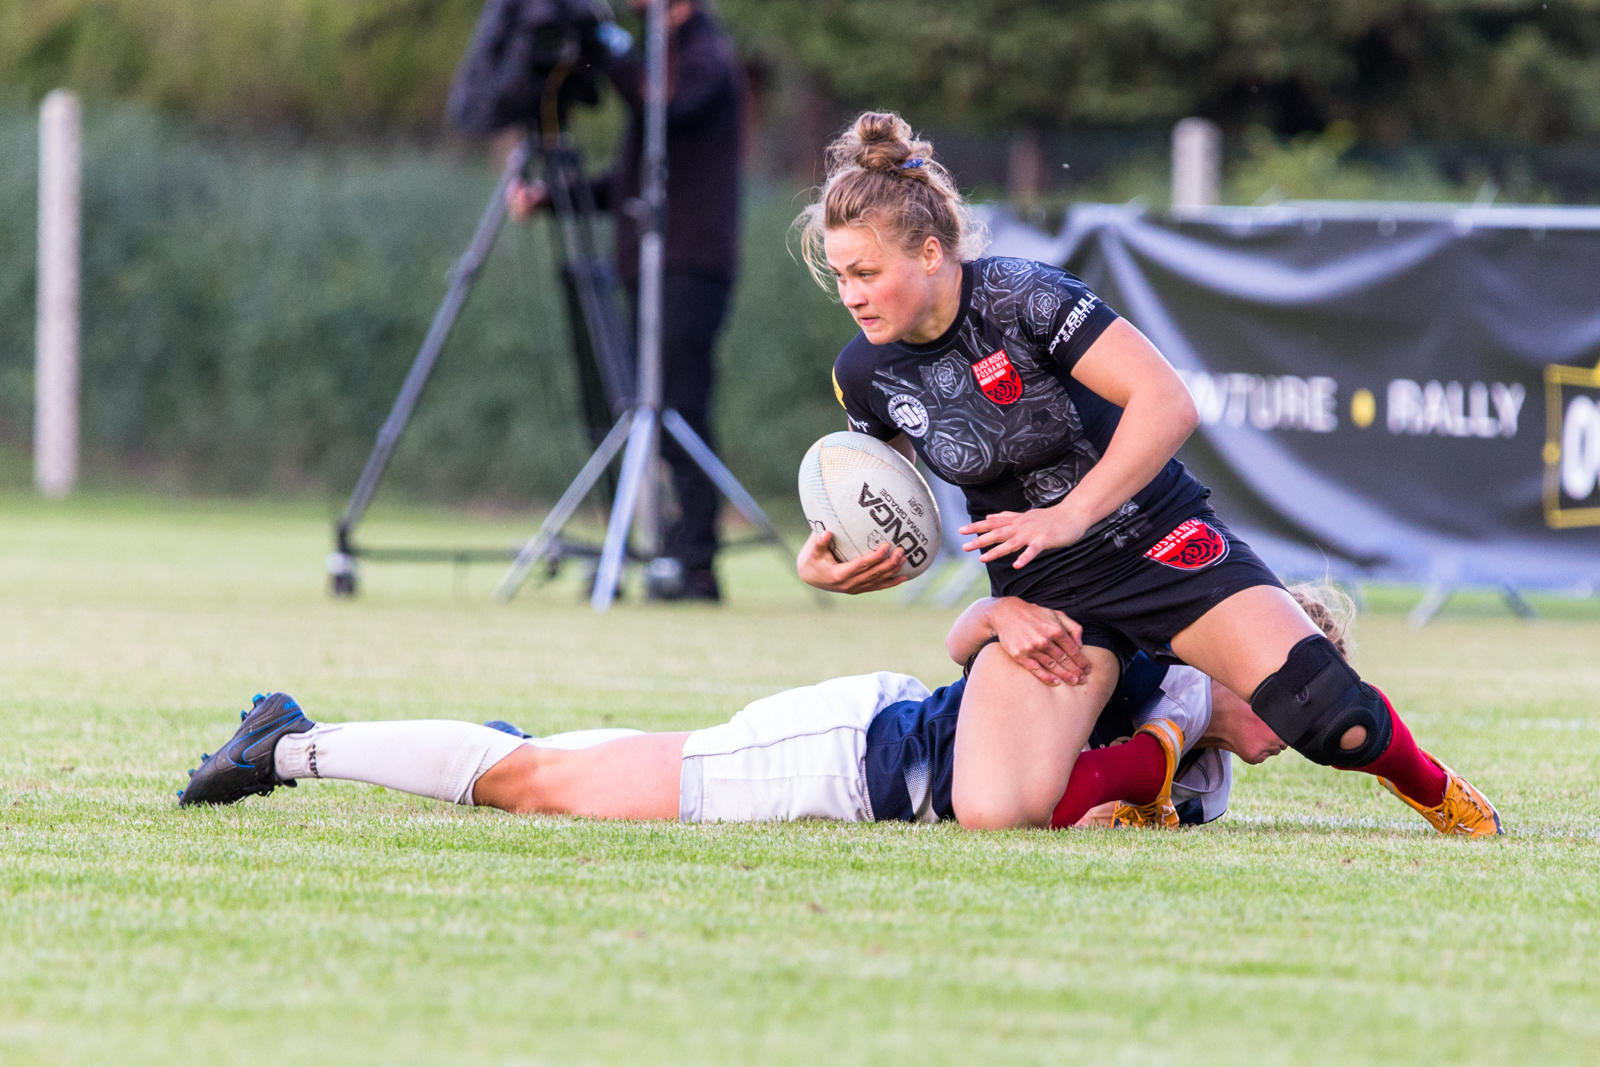 International Rugby Challenge: Black Roses Posnania - USV Poczda  Foto: LepszyPOZNAN.pl / Paweł Rychter